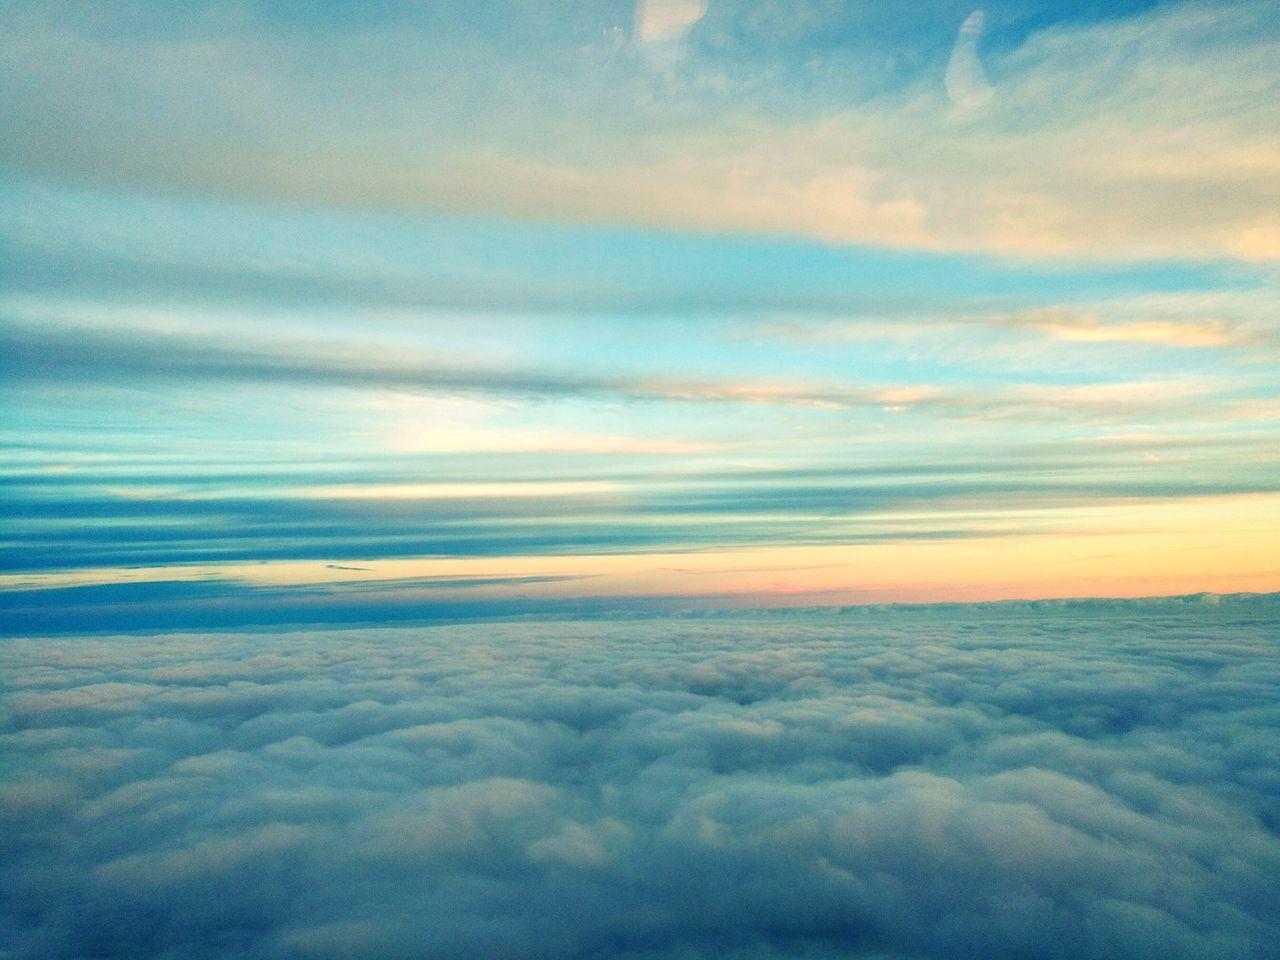 Cloud - Sky Sky Outdoors No People Flying Heaven Heaven♥ Heavenly Heavenly Clouds Heaven небеса небо небо облака небо⛅️ небо и облака